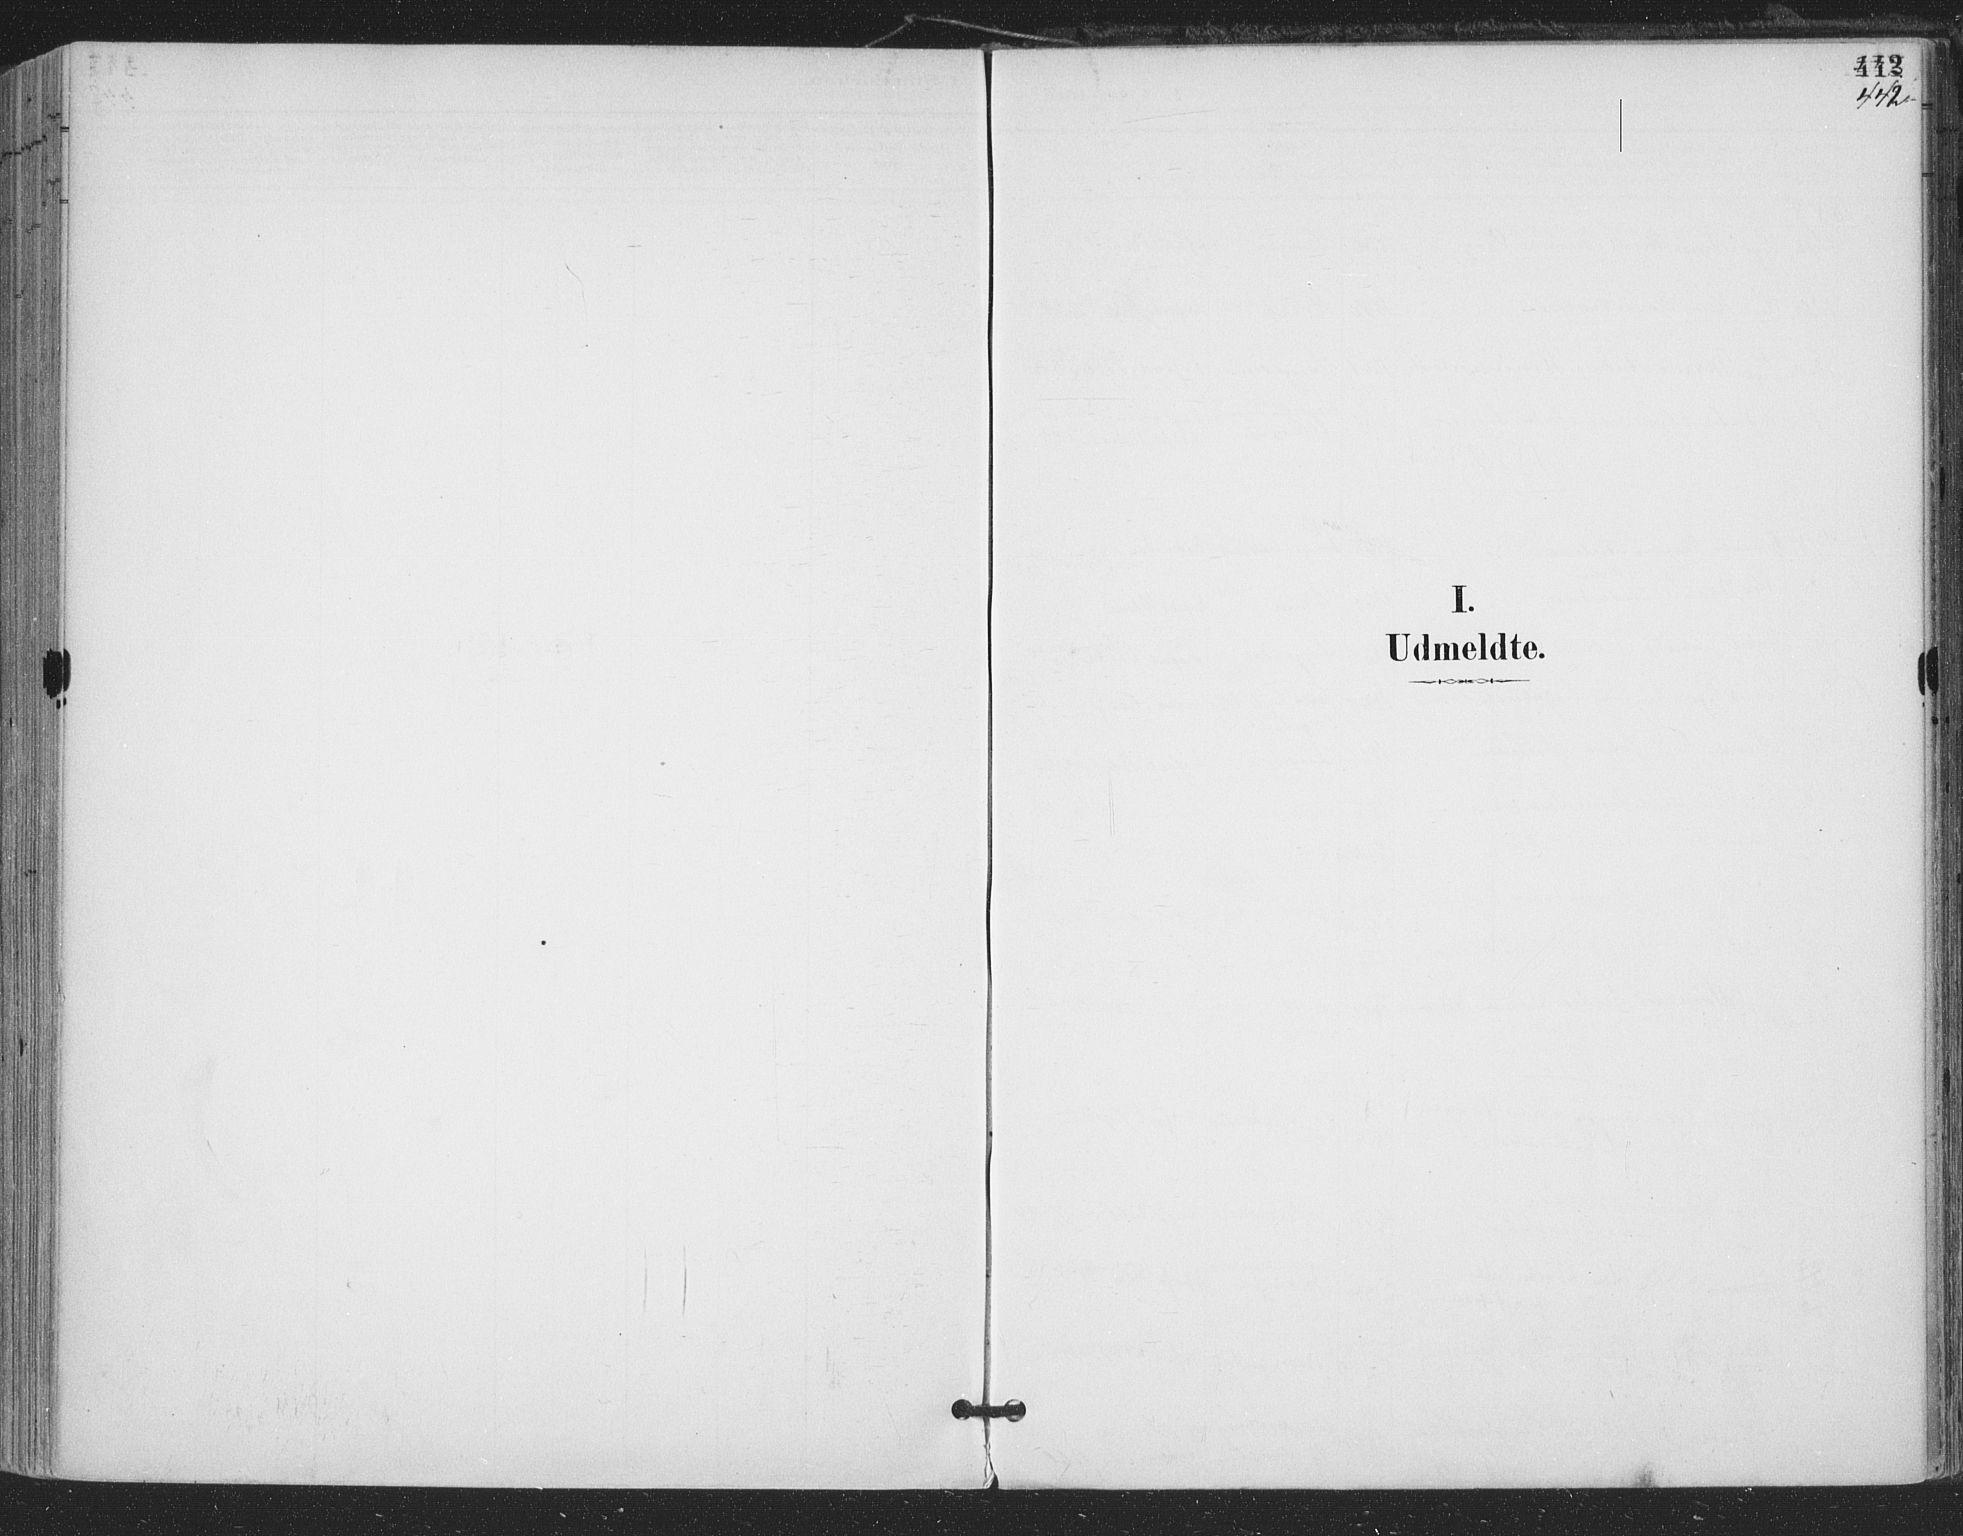 SAKO, Bamble kirkebøker, F/Fa/L0008: Ministerialbok nr. I 8, 1888-1900, s. 442